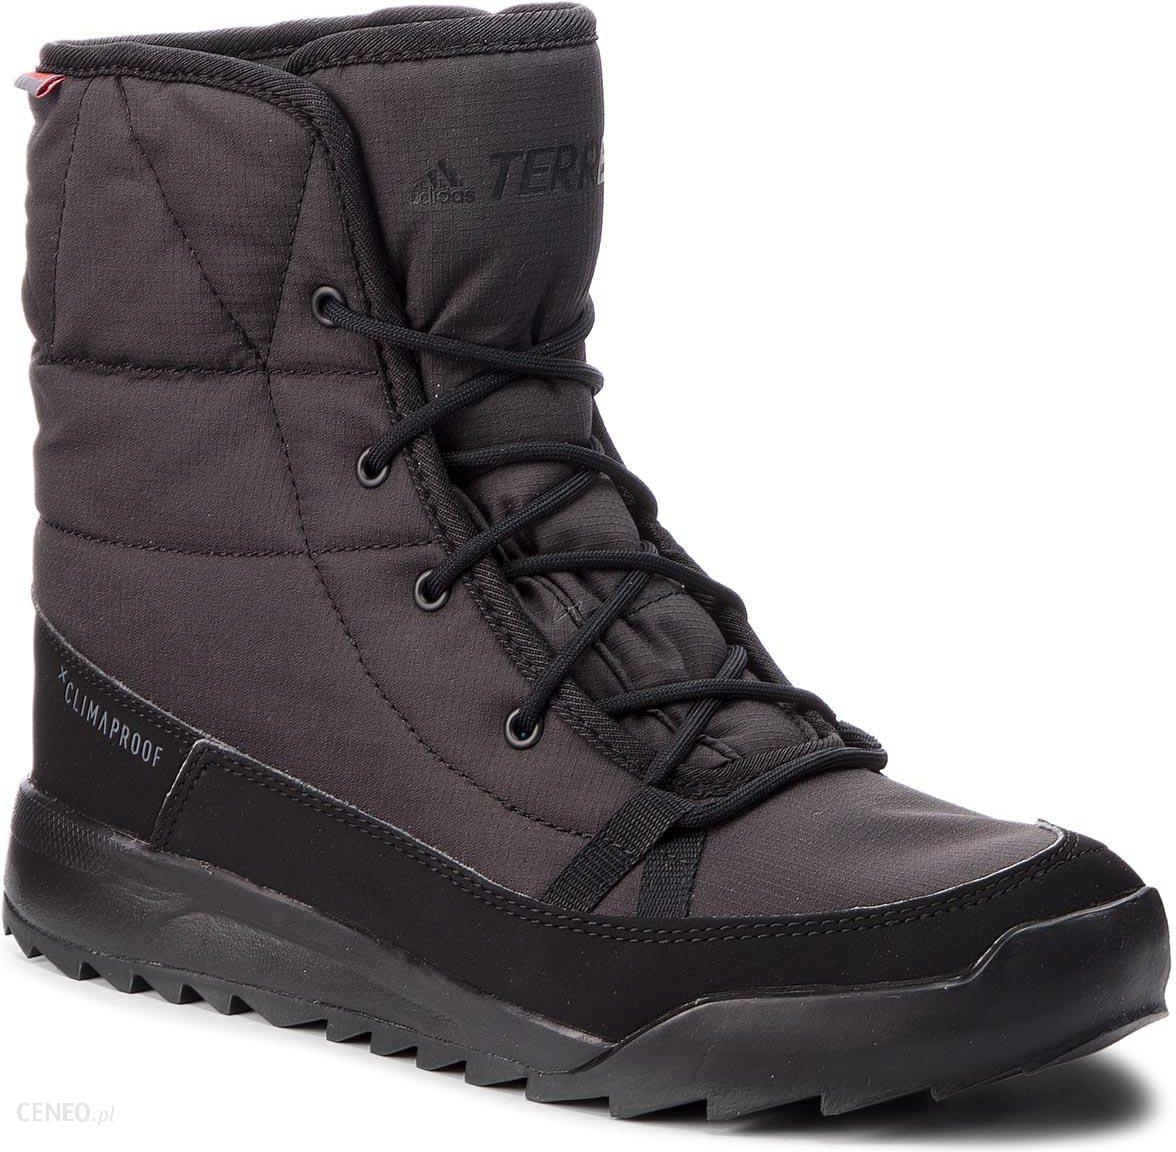 Śniegowce adidas Terrex Choleah Padded Cp S80748 CblackCblackGrefiv Ceny i opinie Ceneo.pl